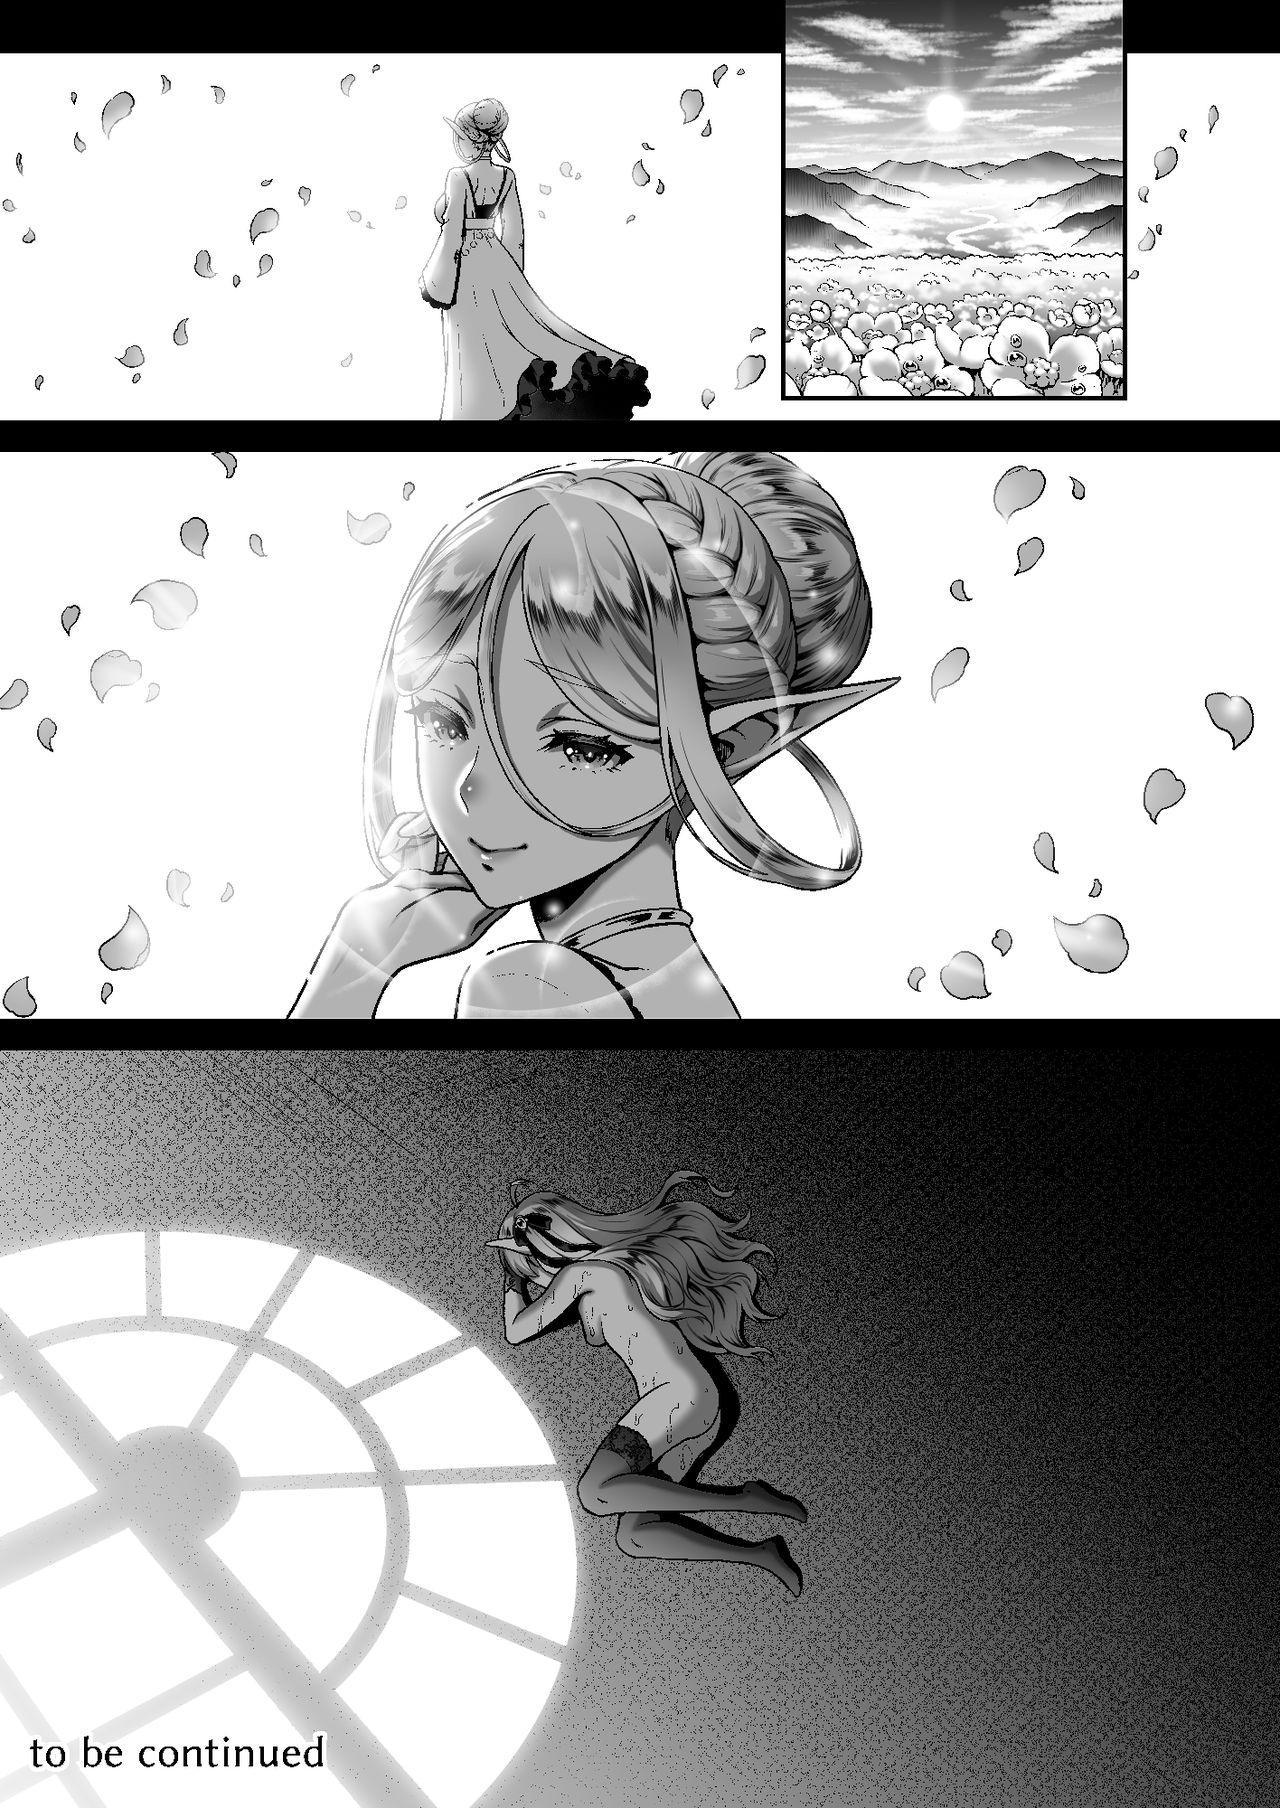 Tasogare no Shou Elf 6 - The story of Emma's side   Twilight Elf Prostitute 6 29